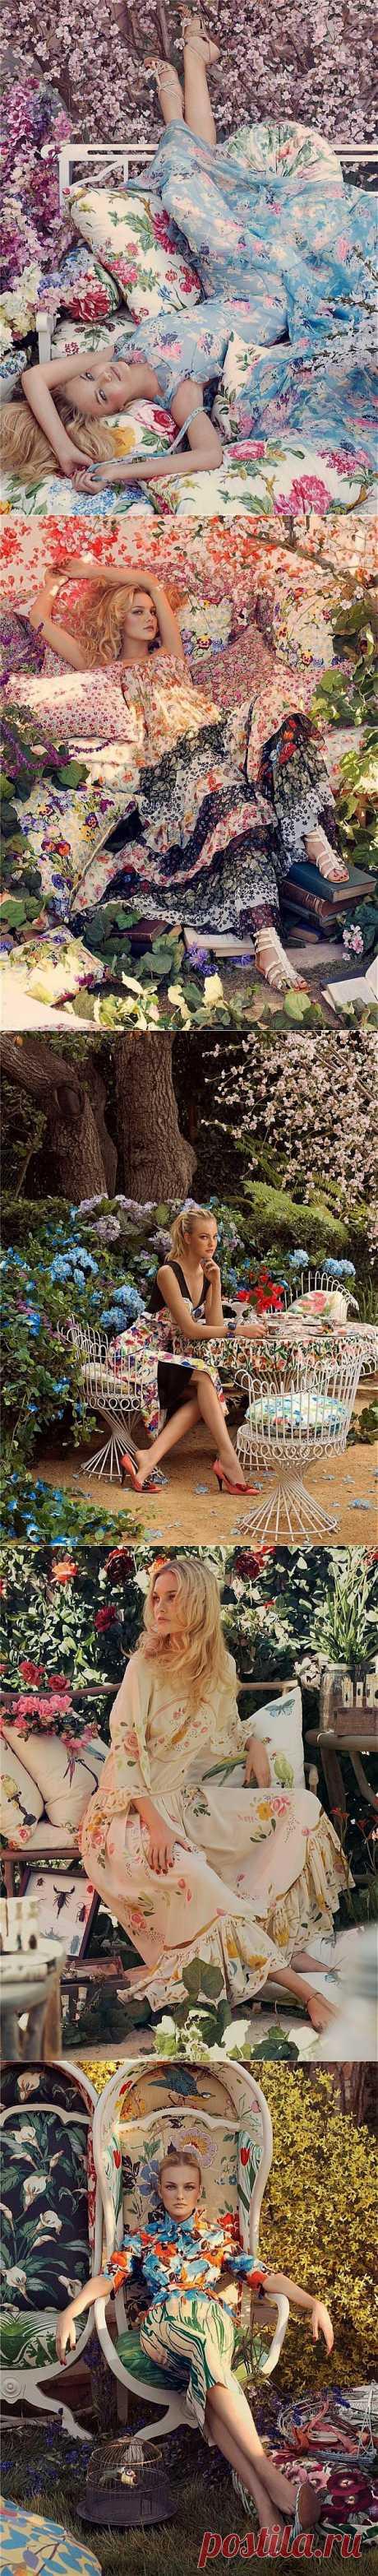 Фотограф Steven Meisel. Женщина-весна..